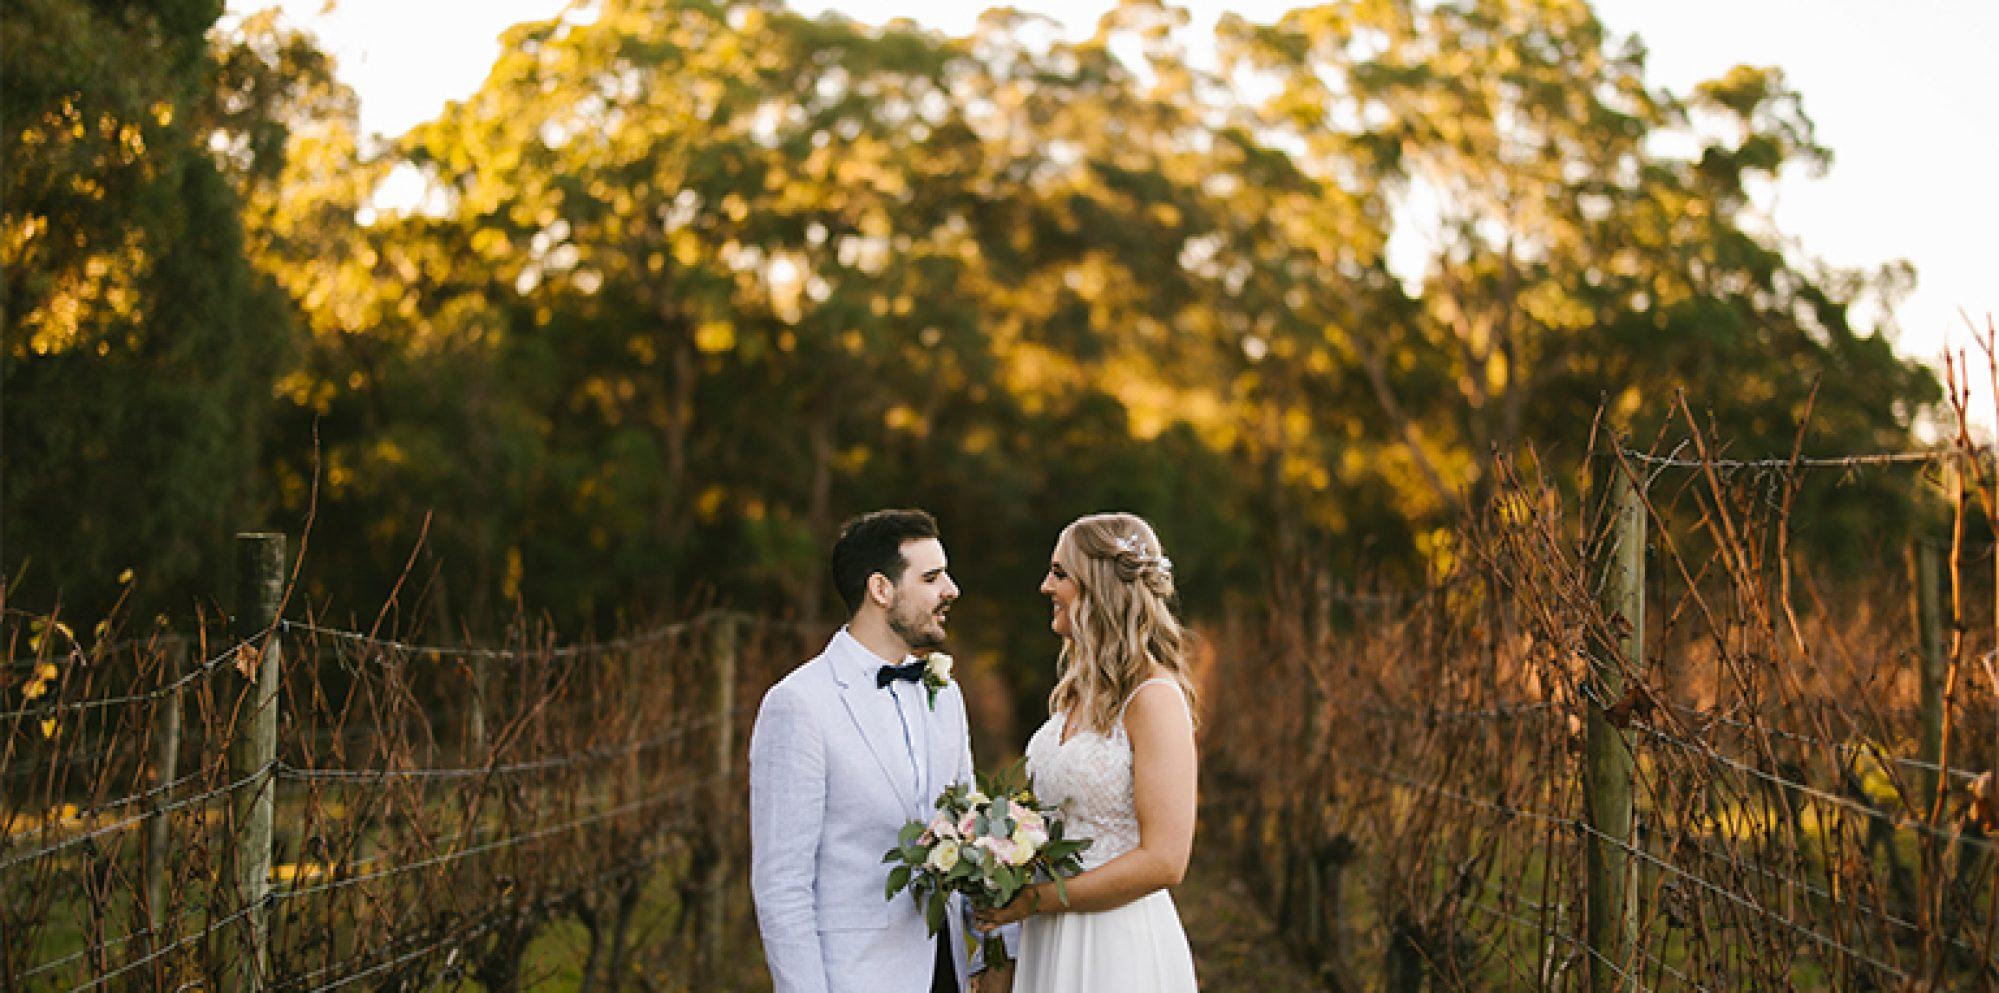 Maddi & james wedding photography @ yarra ranges estate